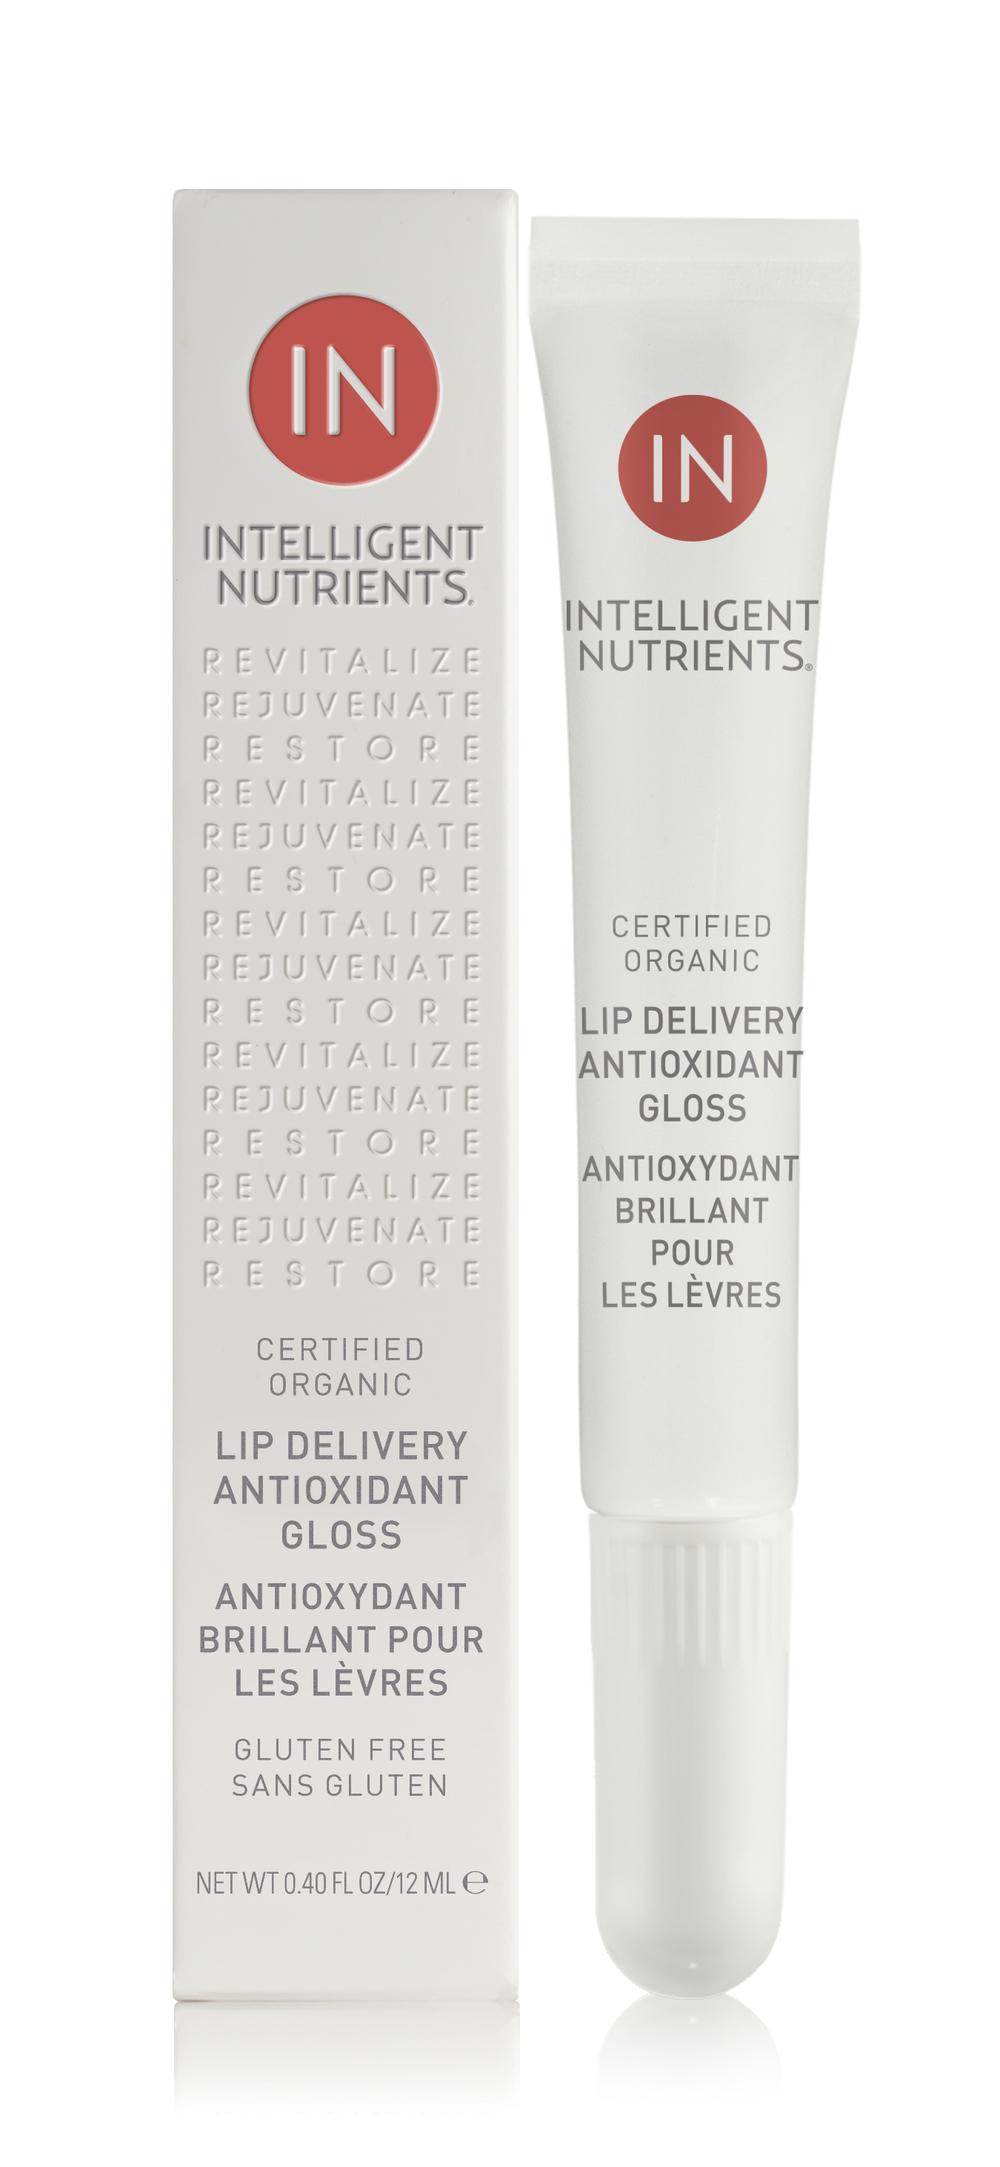 Lip Delivery Antioxidant Gloss - Glazed Peony (DKK190/12g)